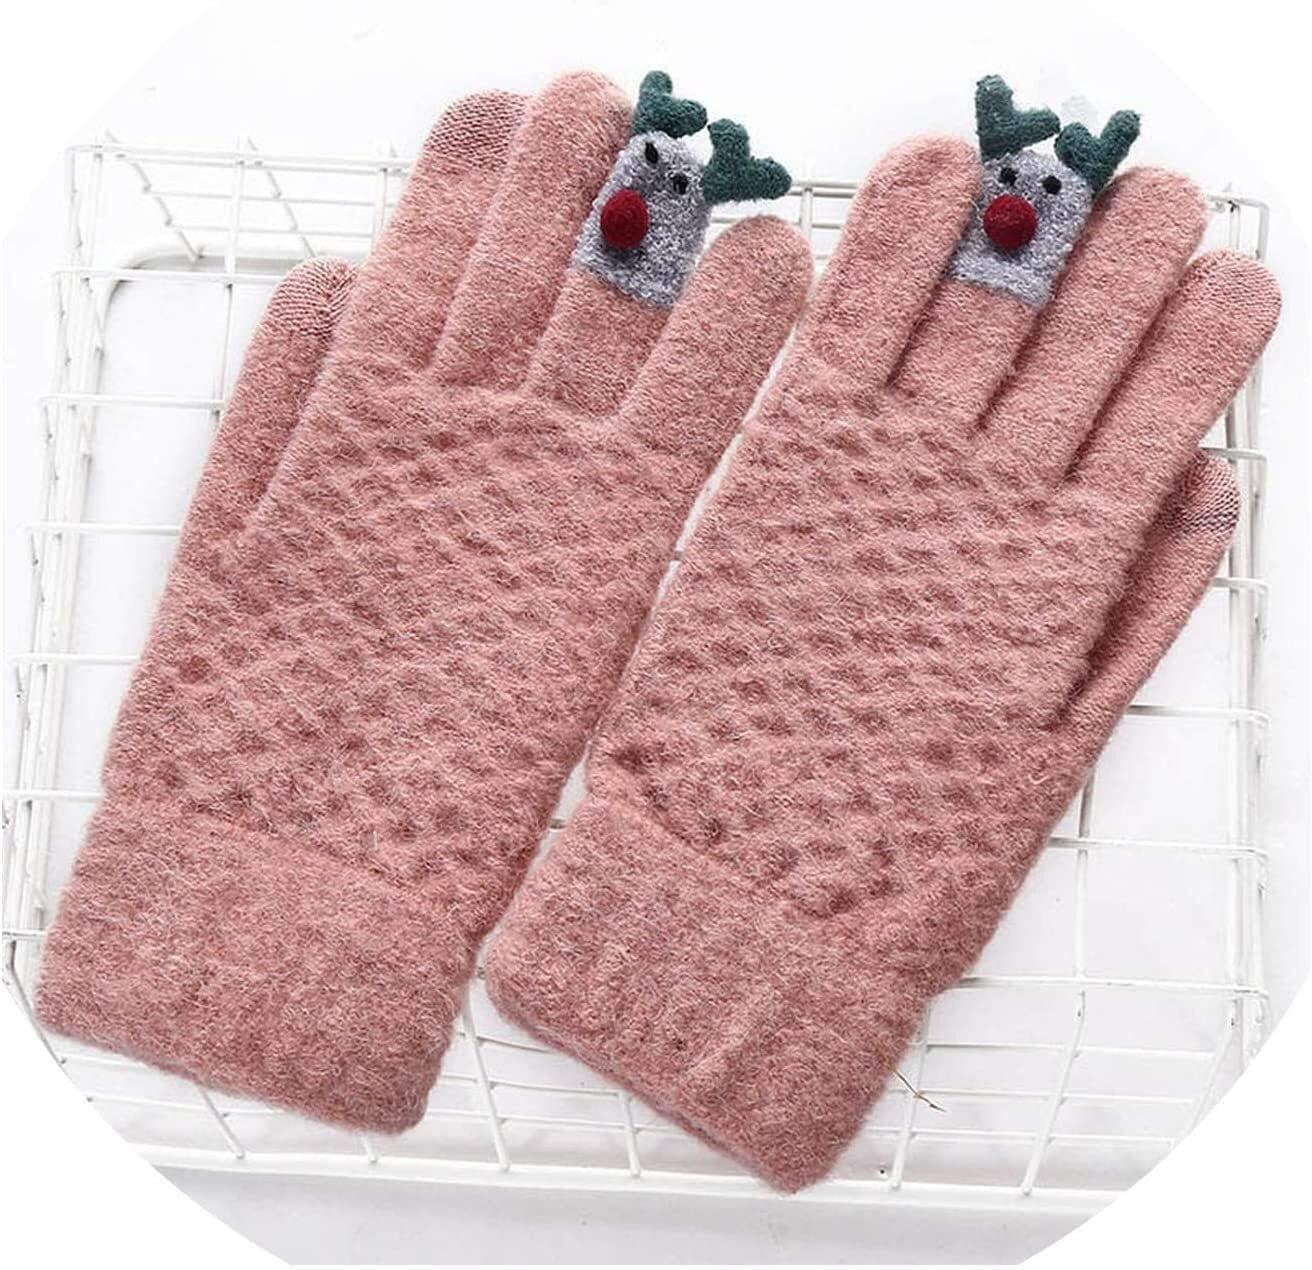 Samantha Warm Gloves Ladies Winter Warm Cute Cartoon Finger Knit Touch Screen Gloves Women Full Finger Soft Mittens Black Gloves (Color : F Pink, Size : Oneszie)